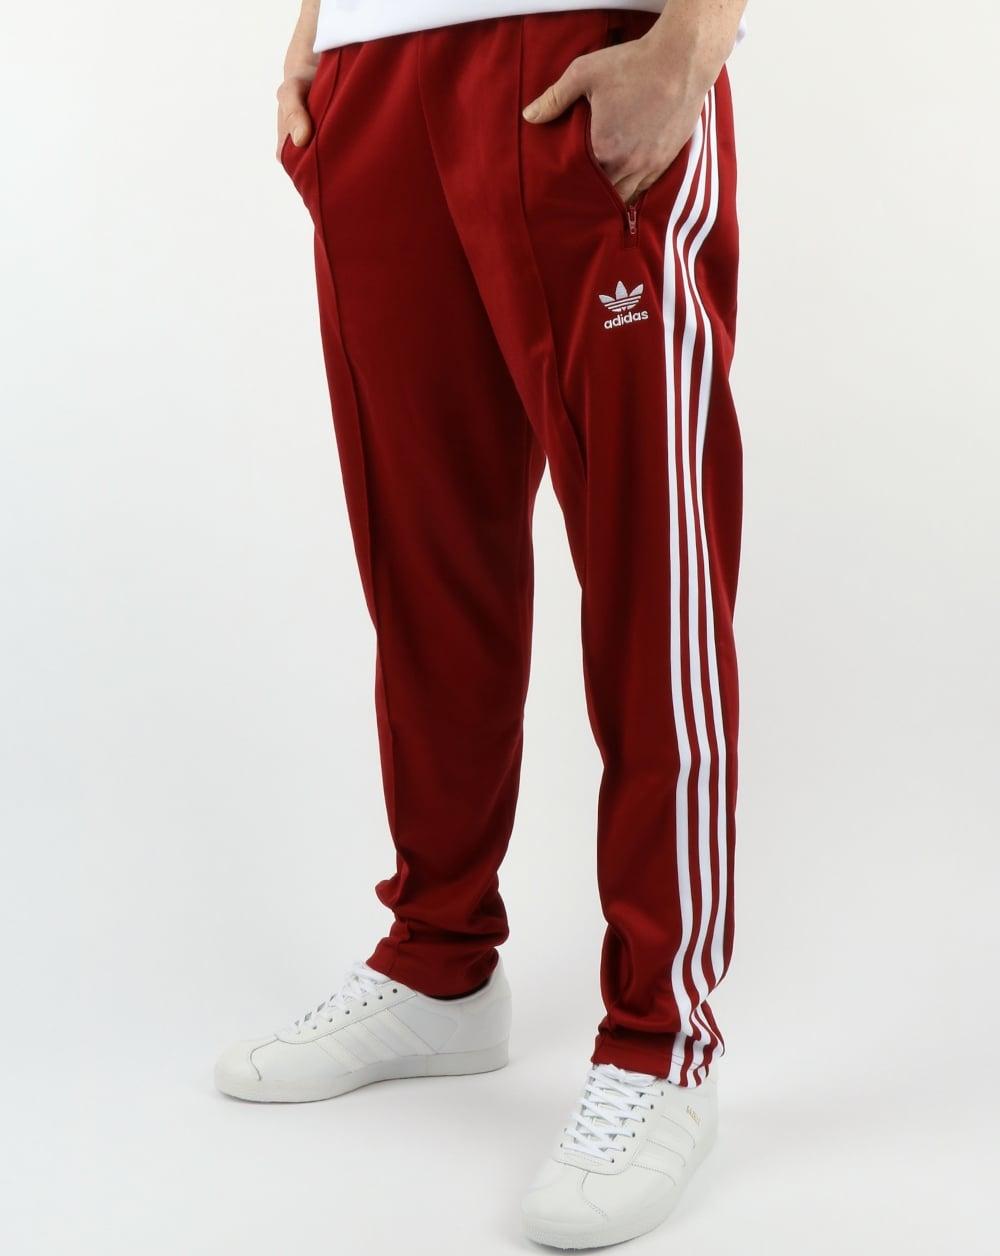 4315d0f2b491 adidas Originals Adidas Originals Beckenbauer Track Pants Rust Red